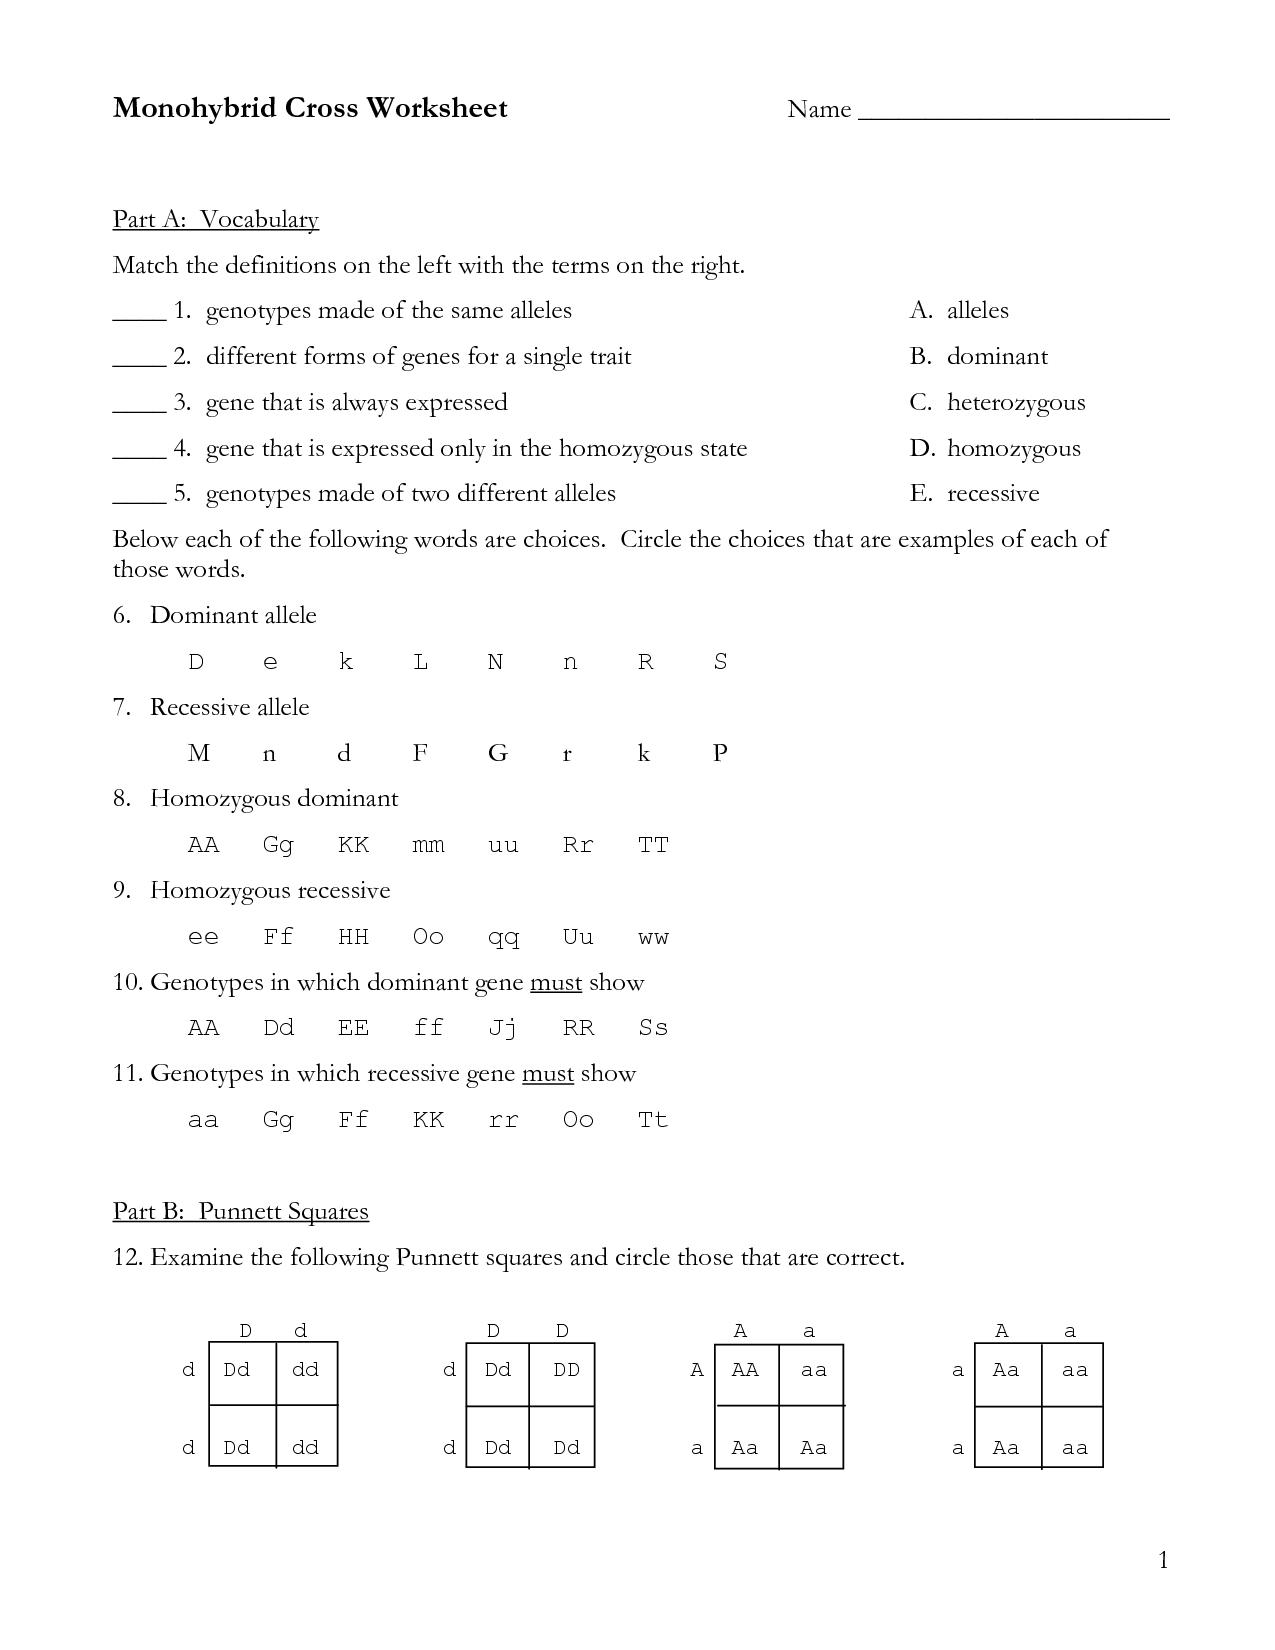 Dihybrid Cross Homework Problems Answer Key